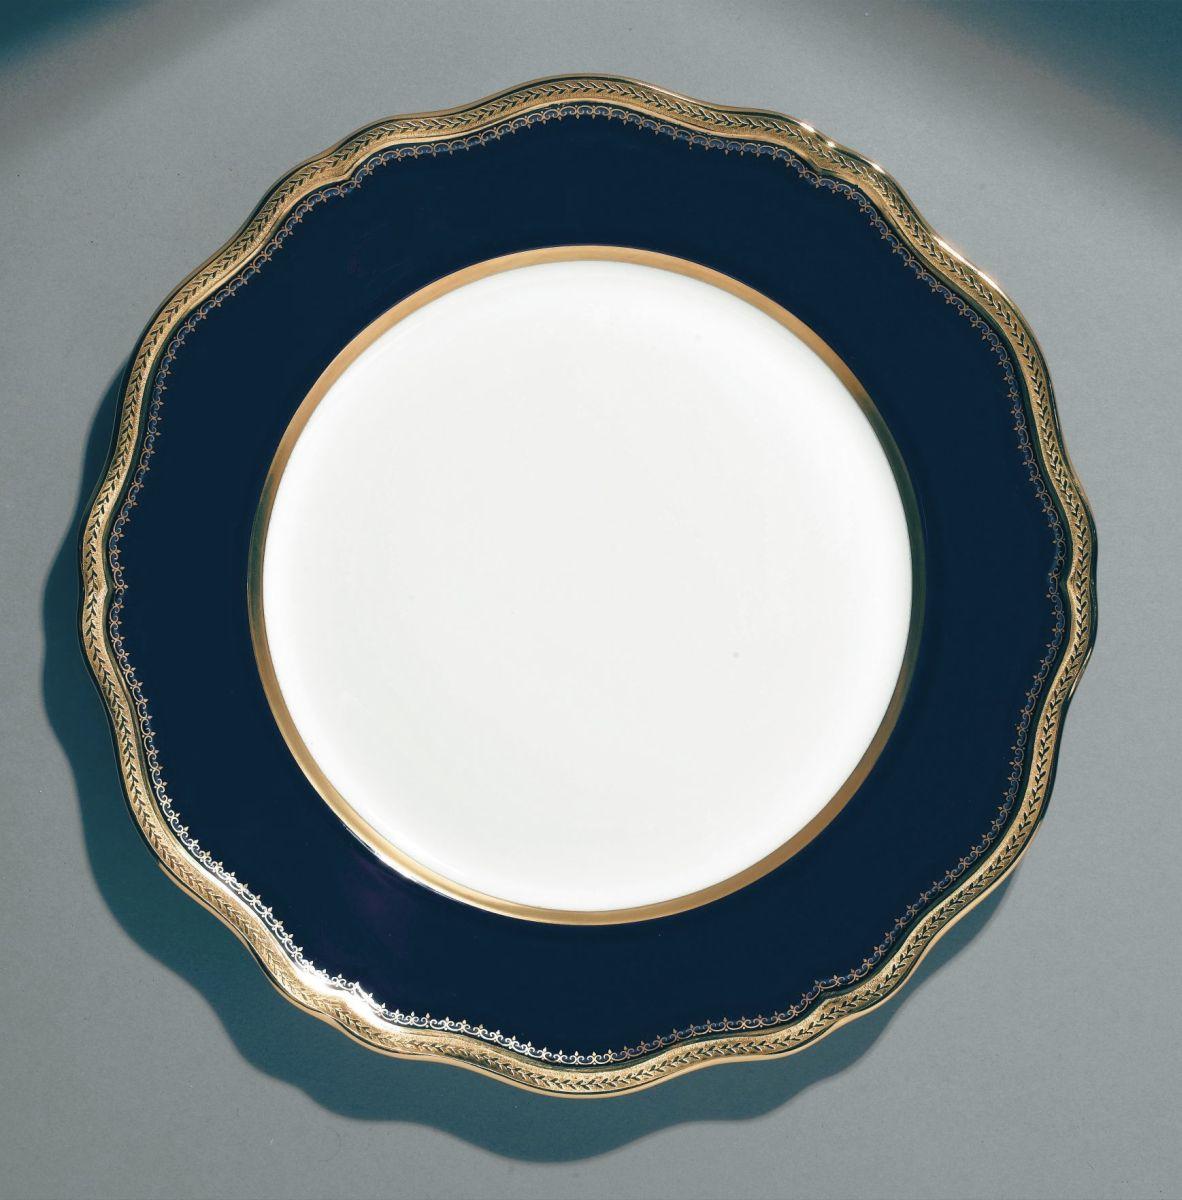 vaisselle raynaud assiette a dessert sikirit sikir004. Black Bedroom Furniture Sets. Home Design Ideas